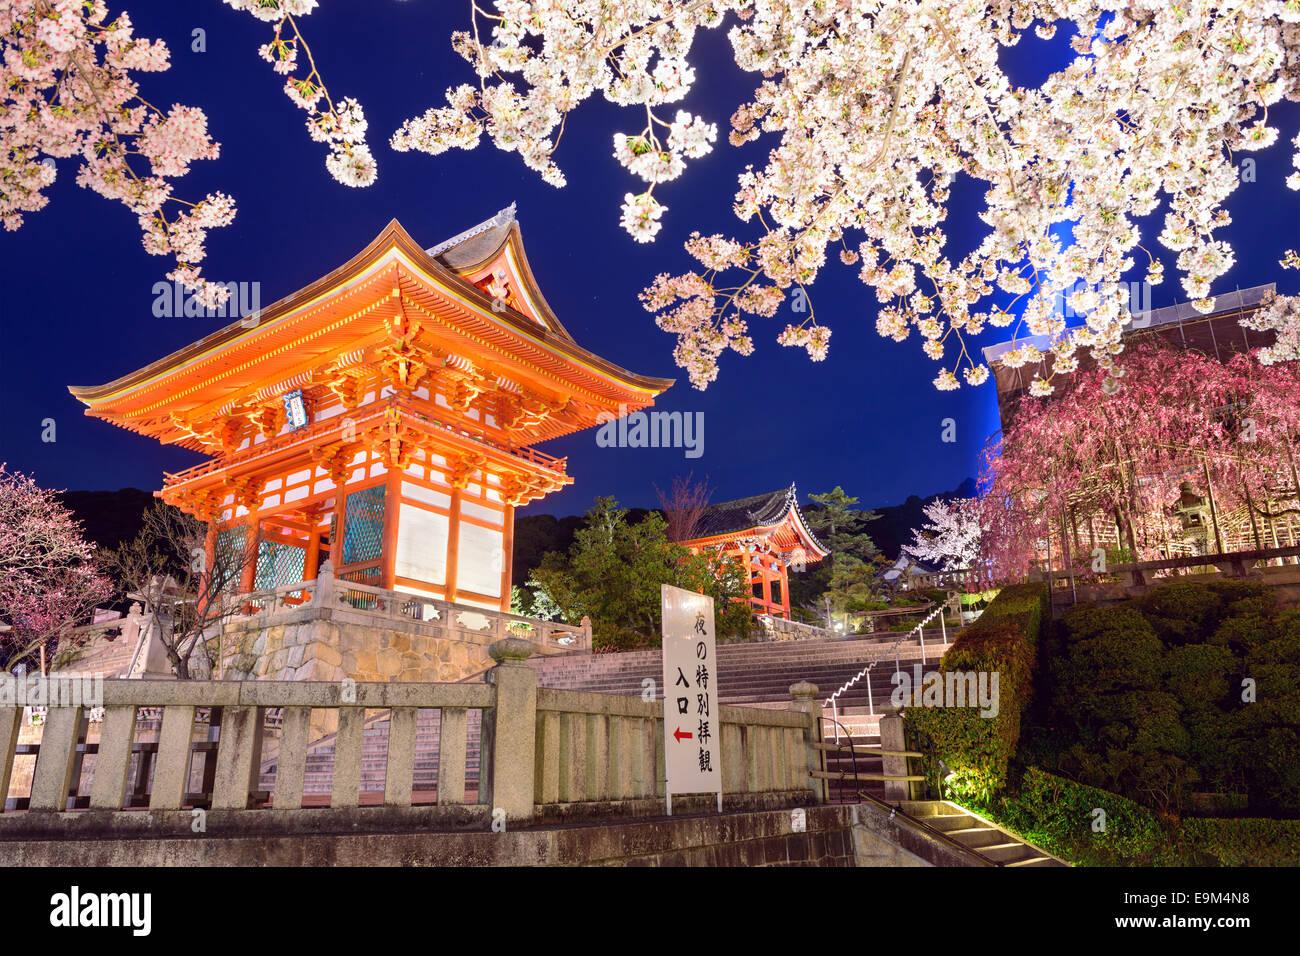 Kyoto, Japan at Kiyomizu-dera Shrine In the Spring. - Stock Image